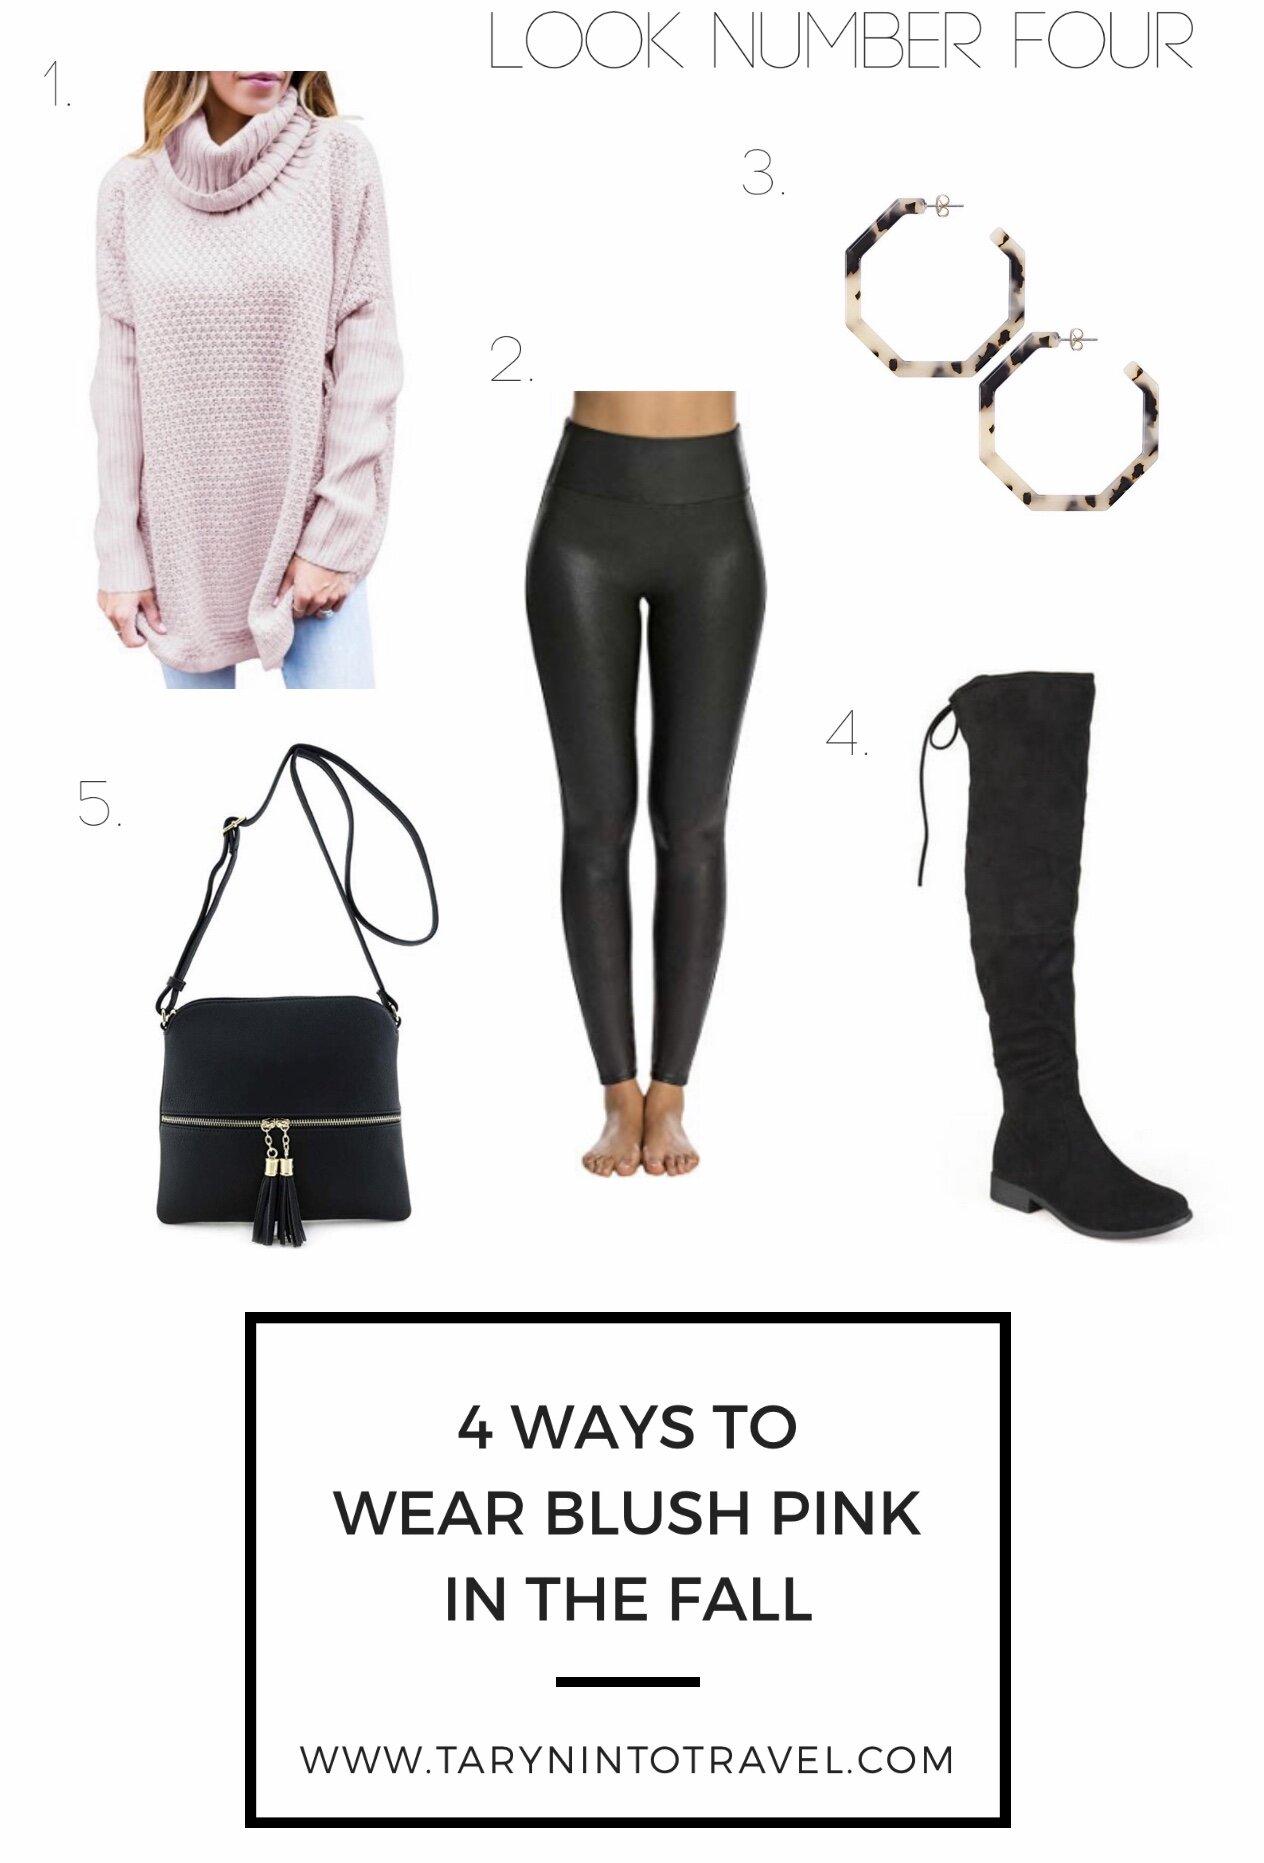 www.tarynintotravel.com | 4 Ways to Wear Blush Pink in the Fall | #blushpinkinthefall #fallhowto #pinkinfall